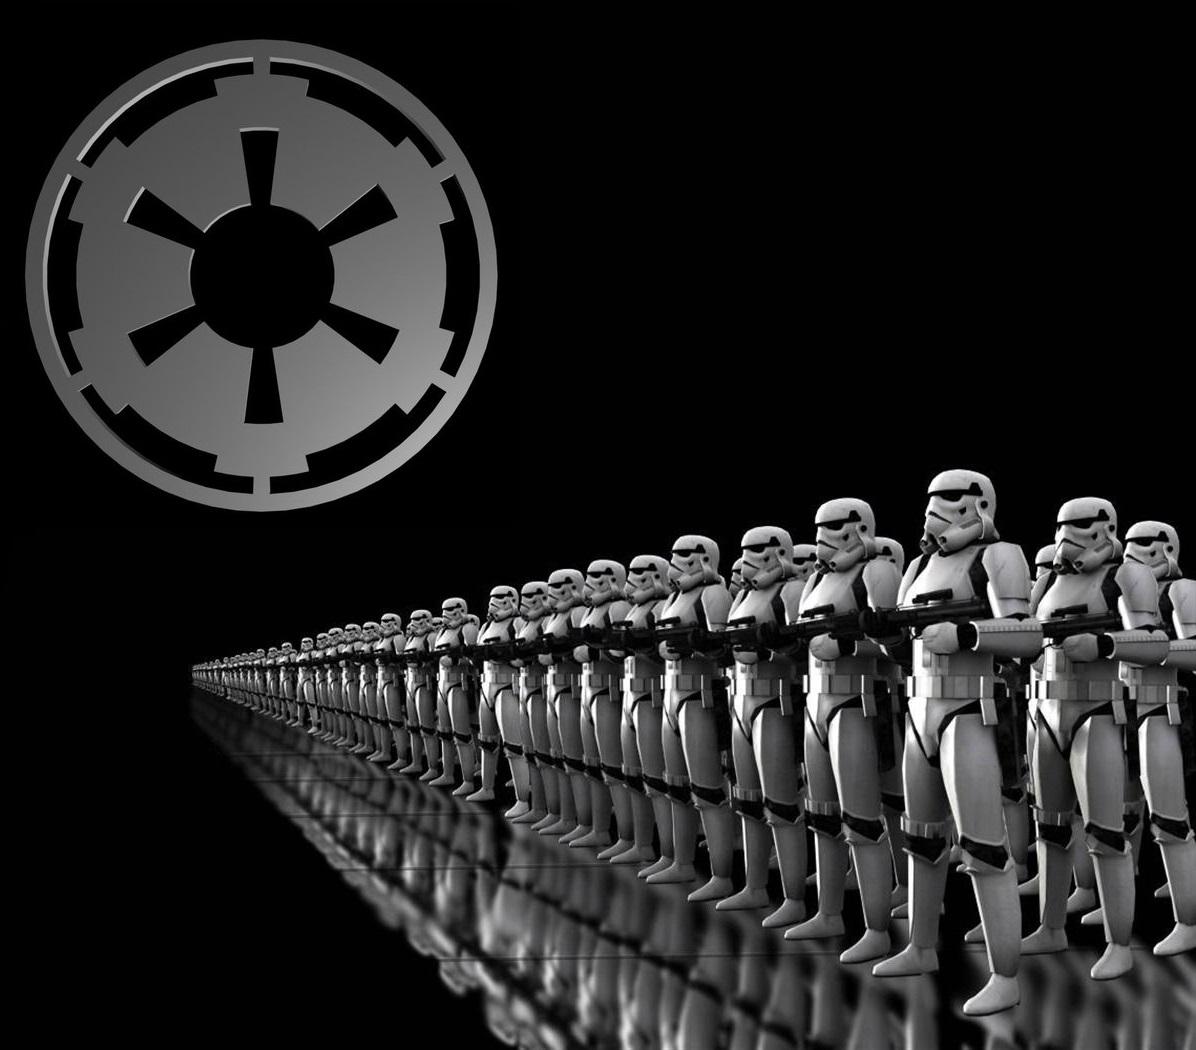 Star Wars Imperial Wallpapers - Wallpaper Cave.jpg